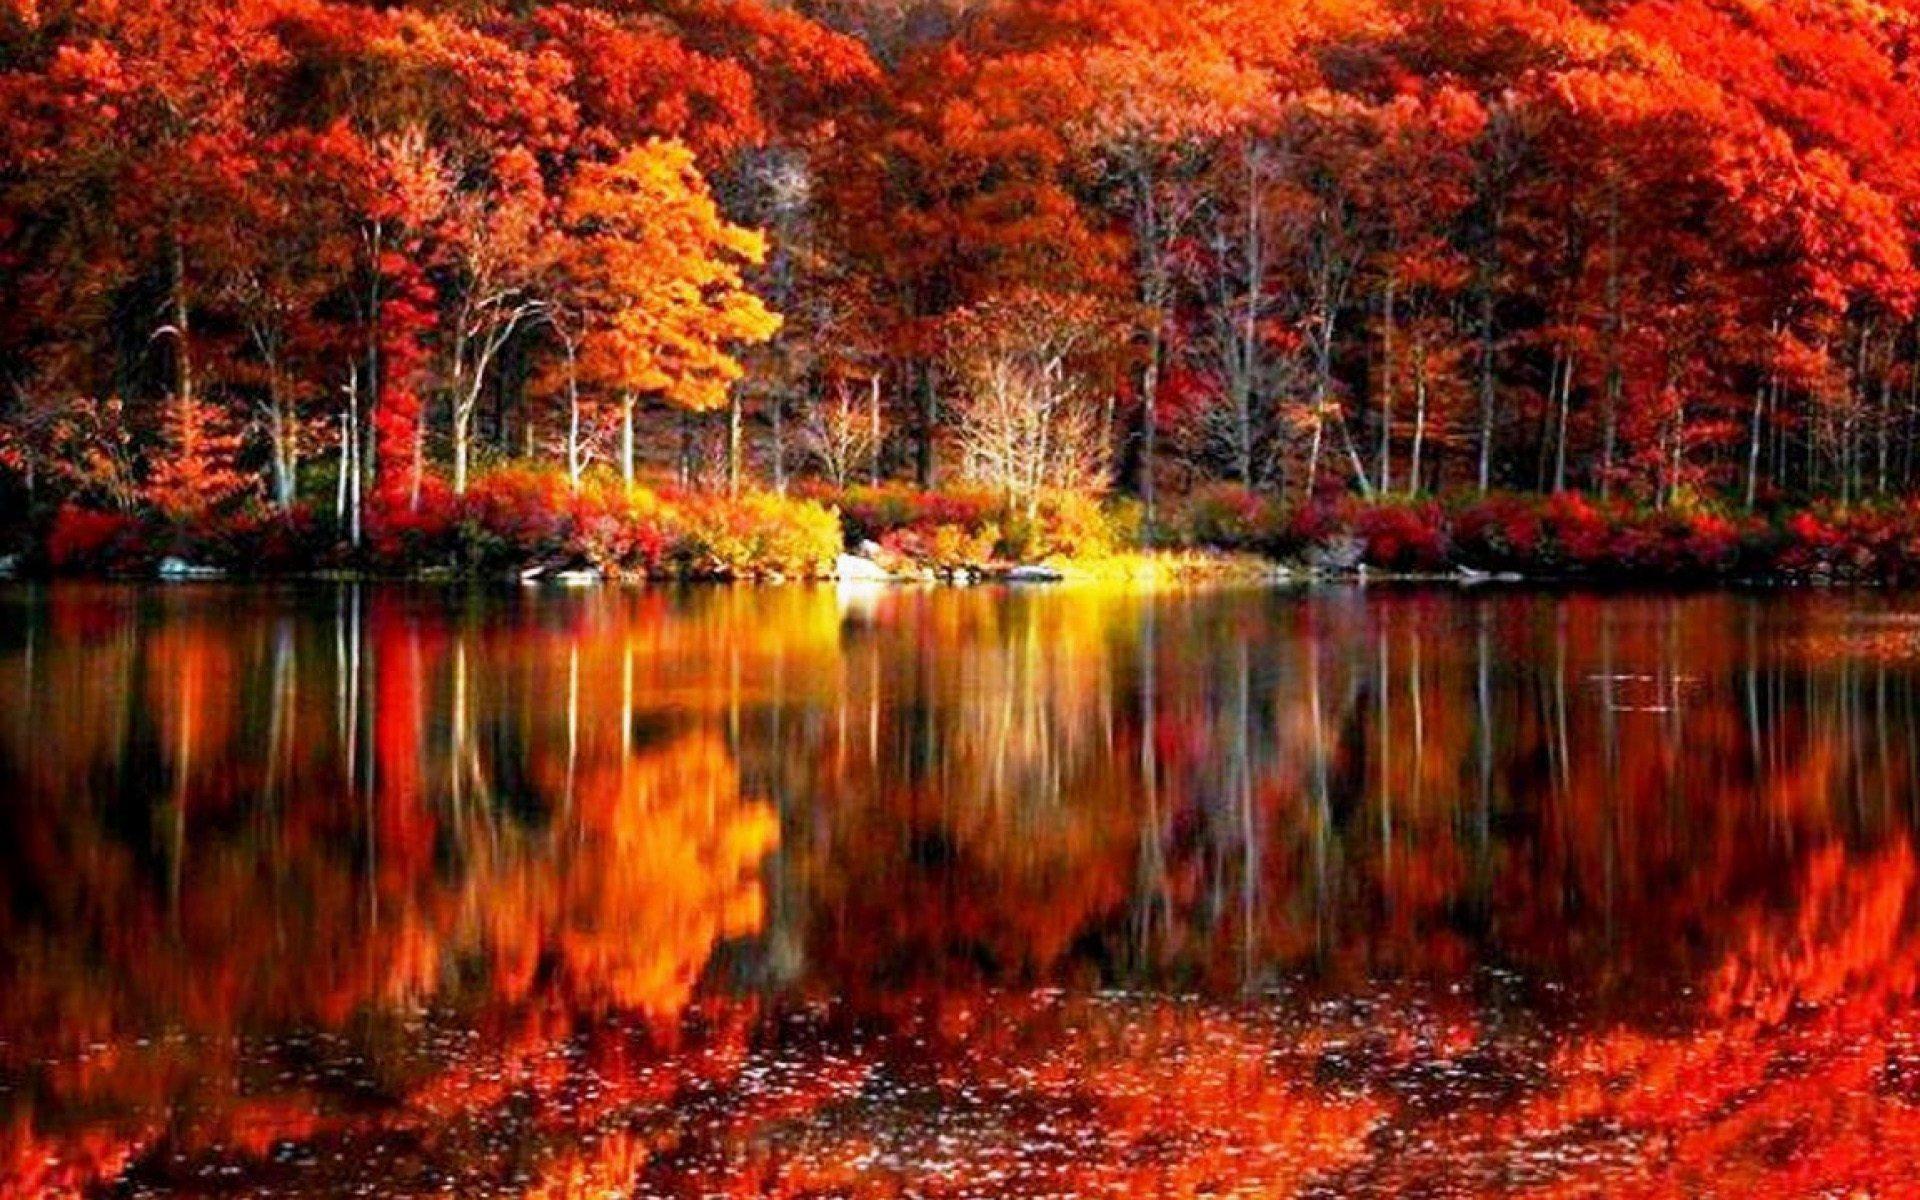 Fall-Scenery-HD-Wallpaper